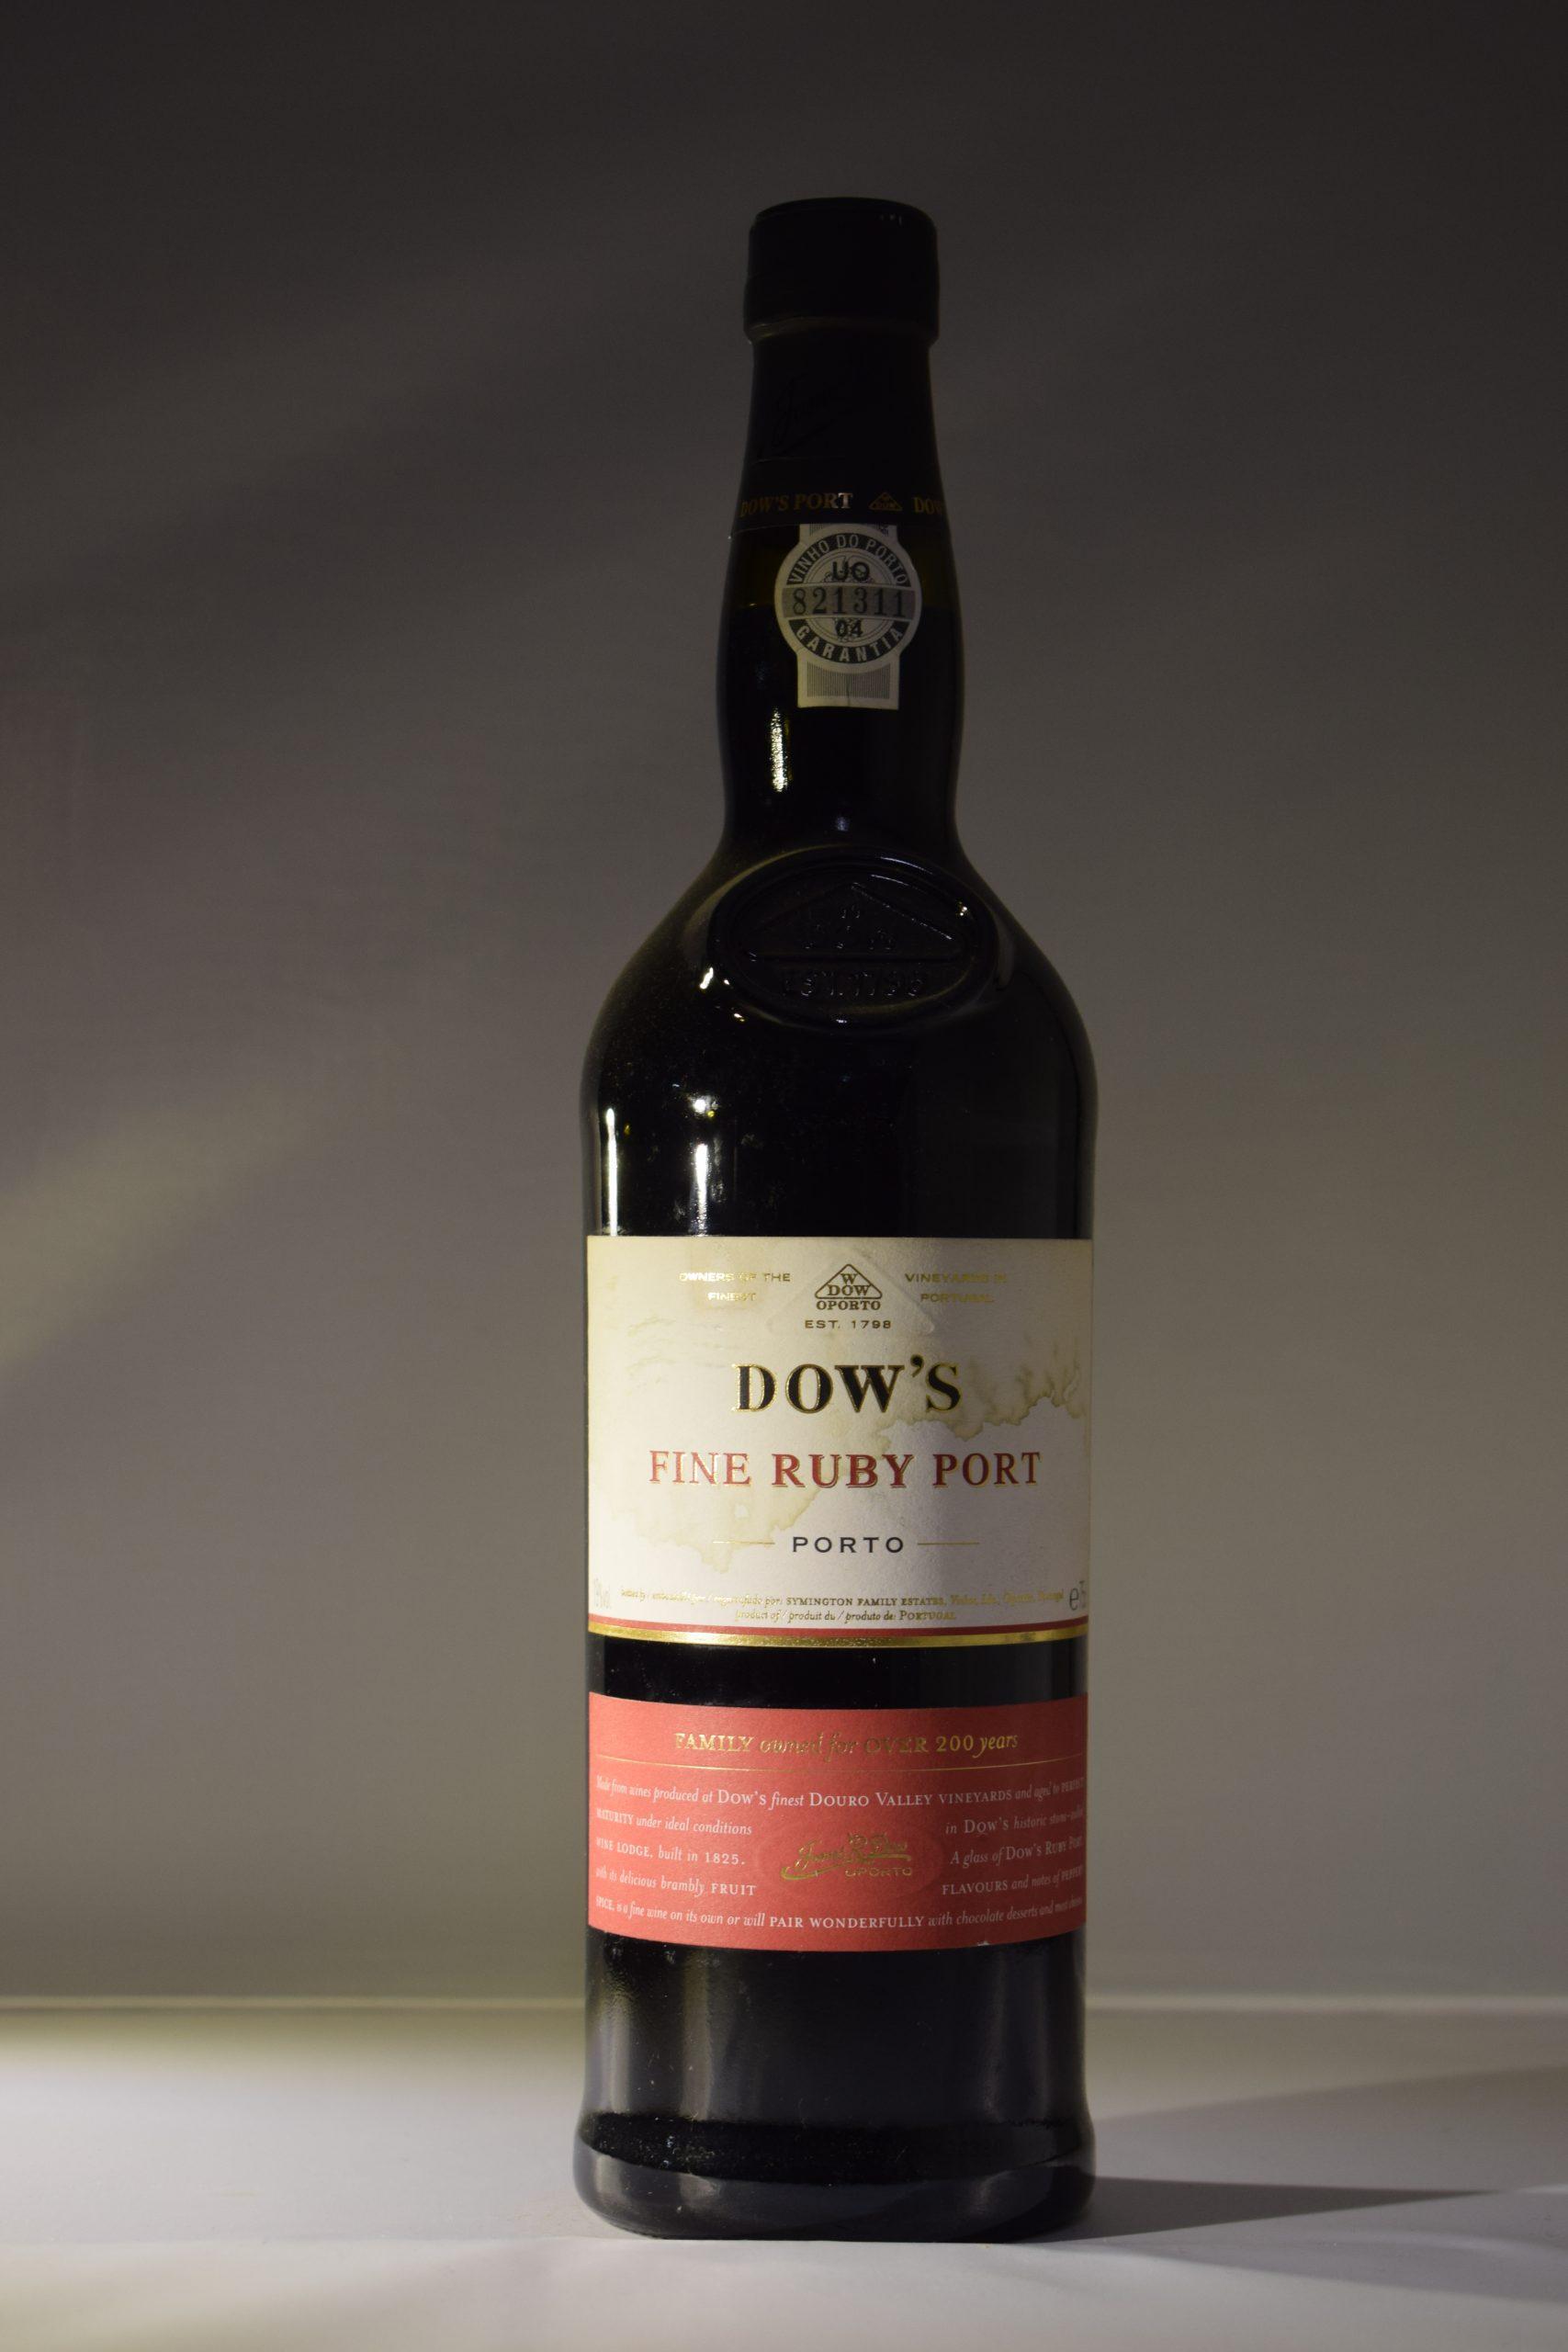 Dows Fine Ruby Port